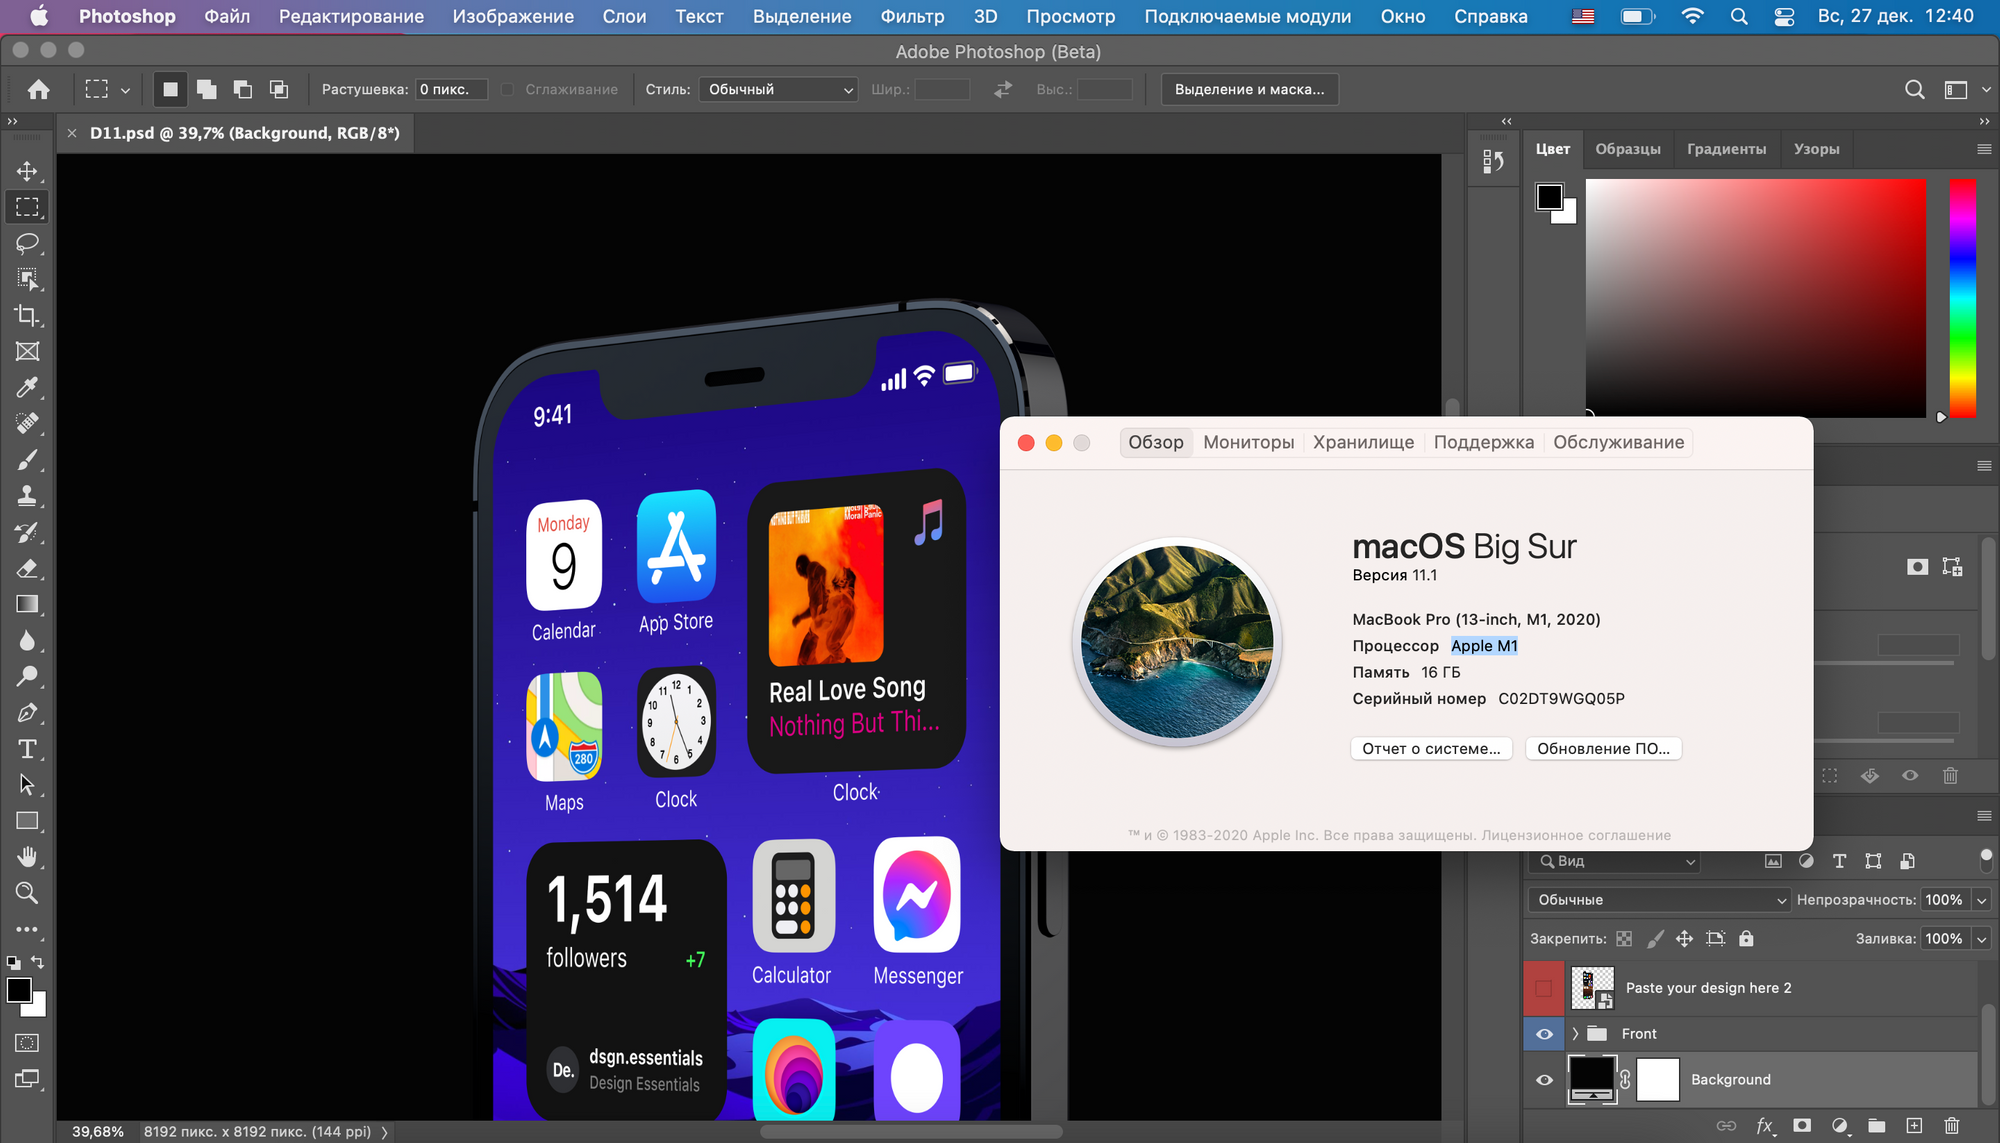 Adobe Photoshop работает на M1, MacBook pro 13 2020